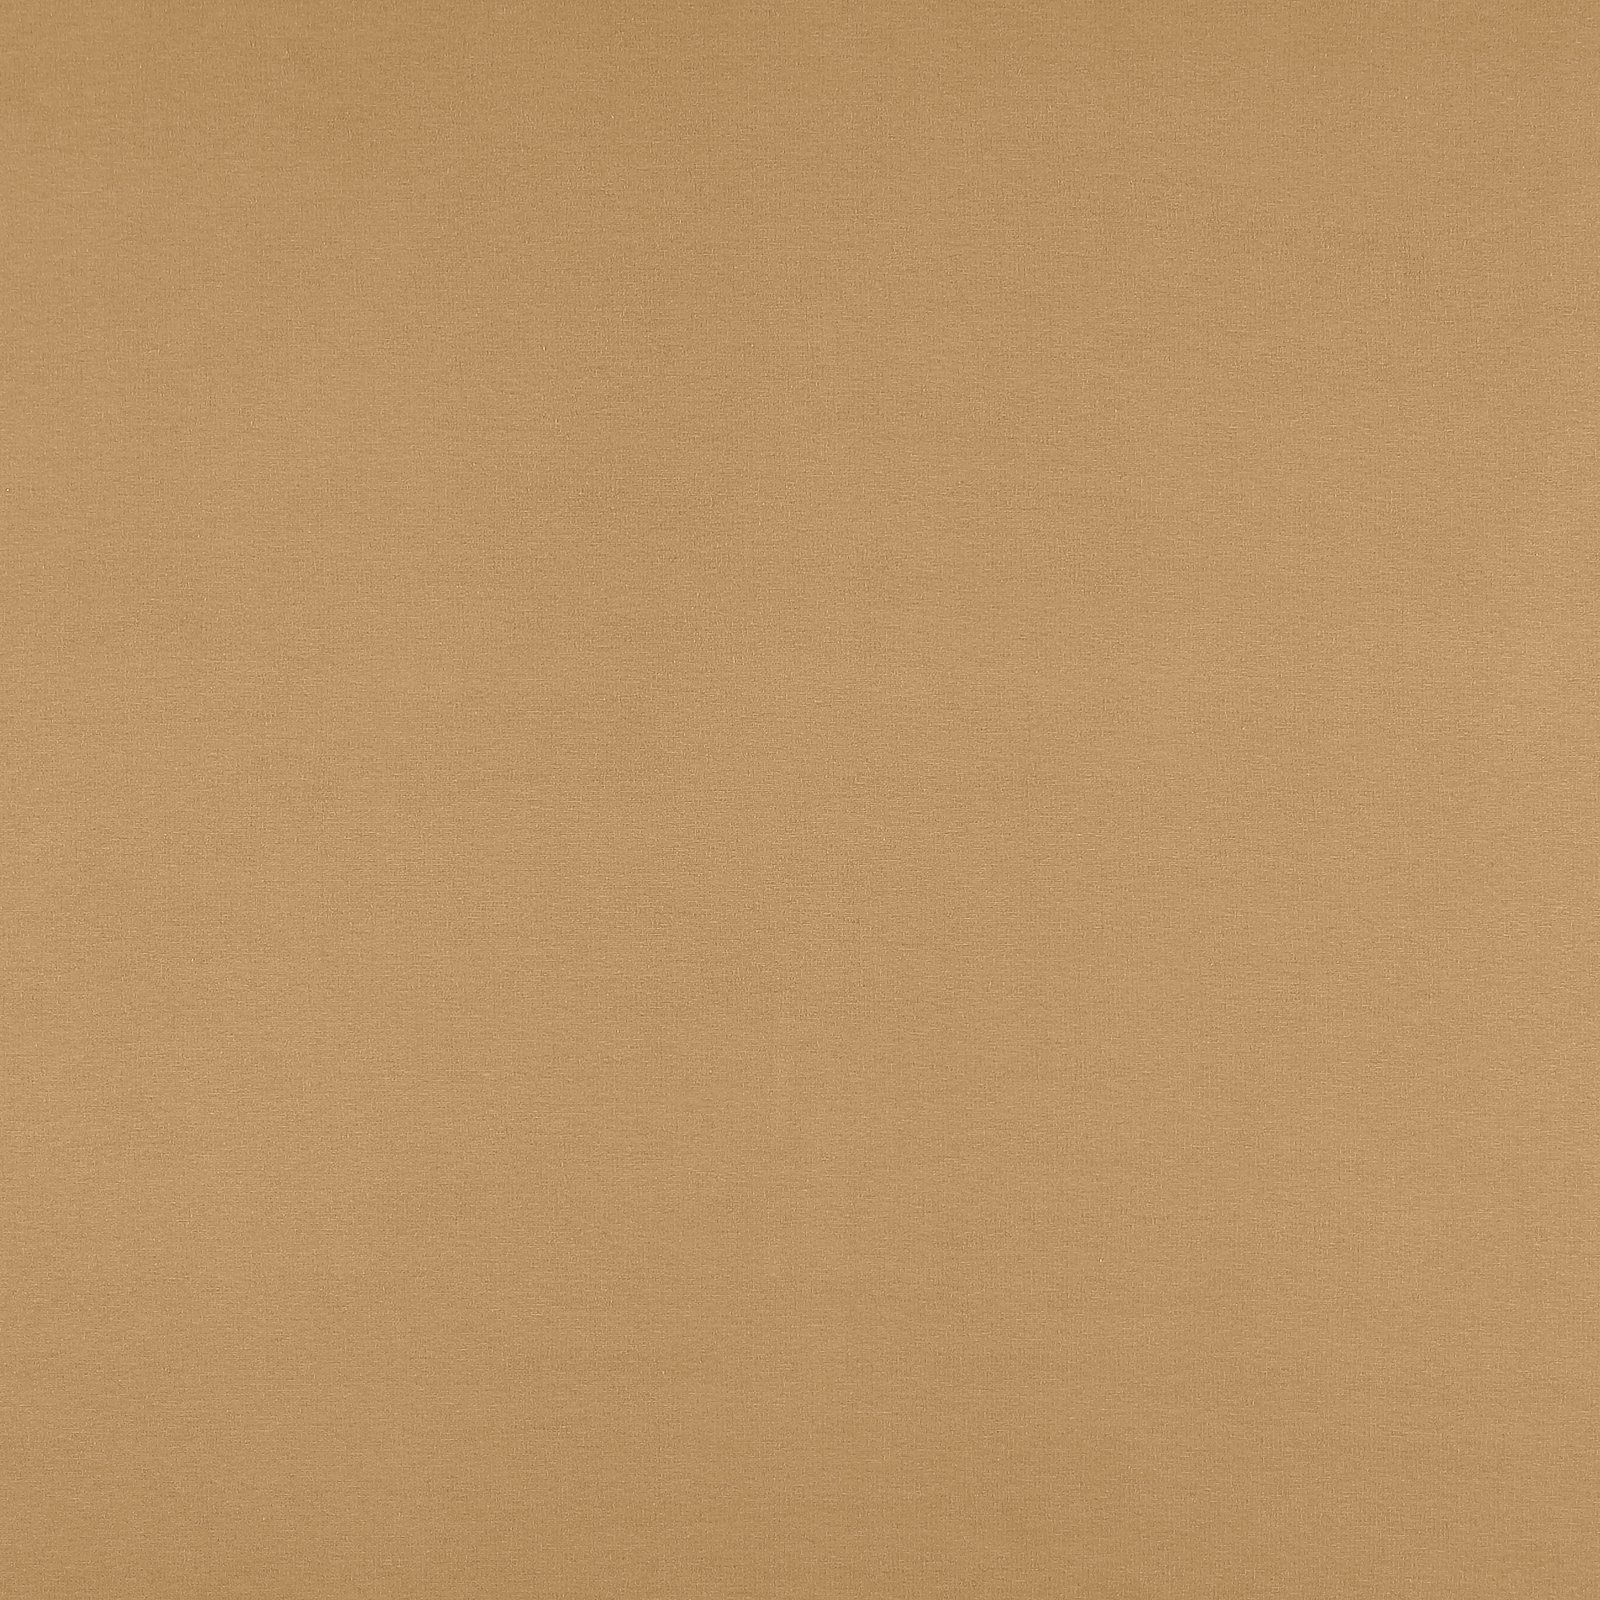 Organic rib dark beige 230660_pack_solid